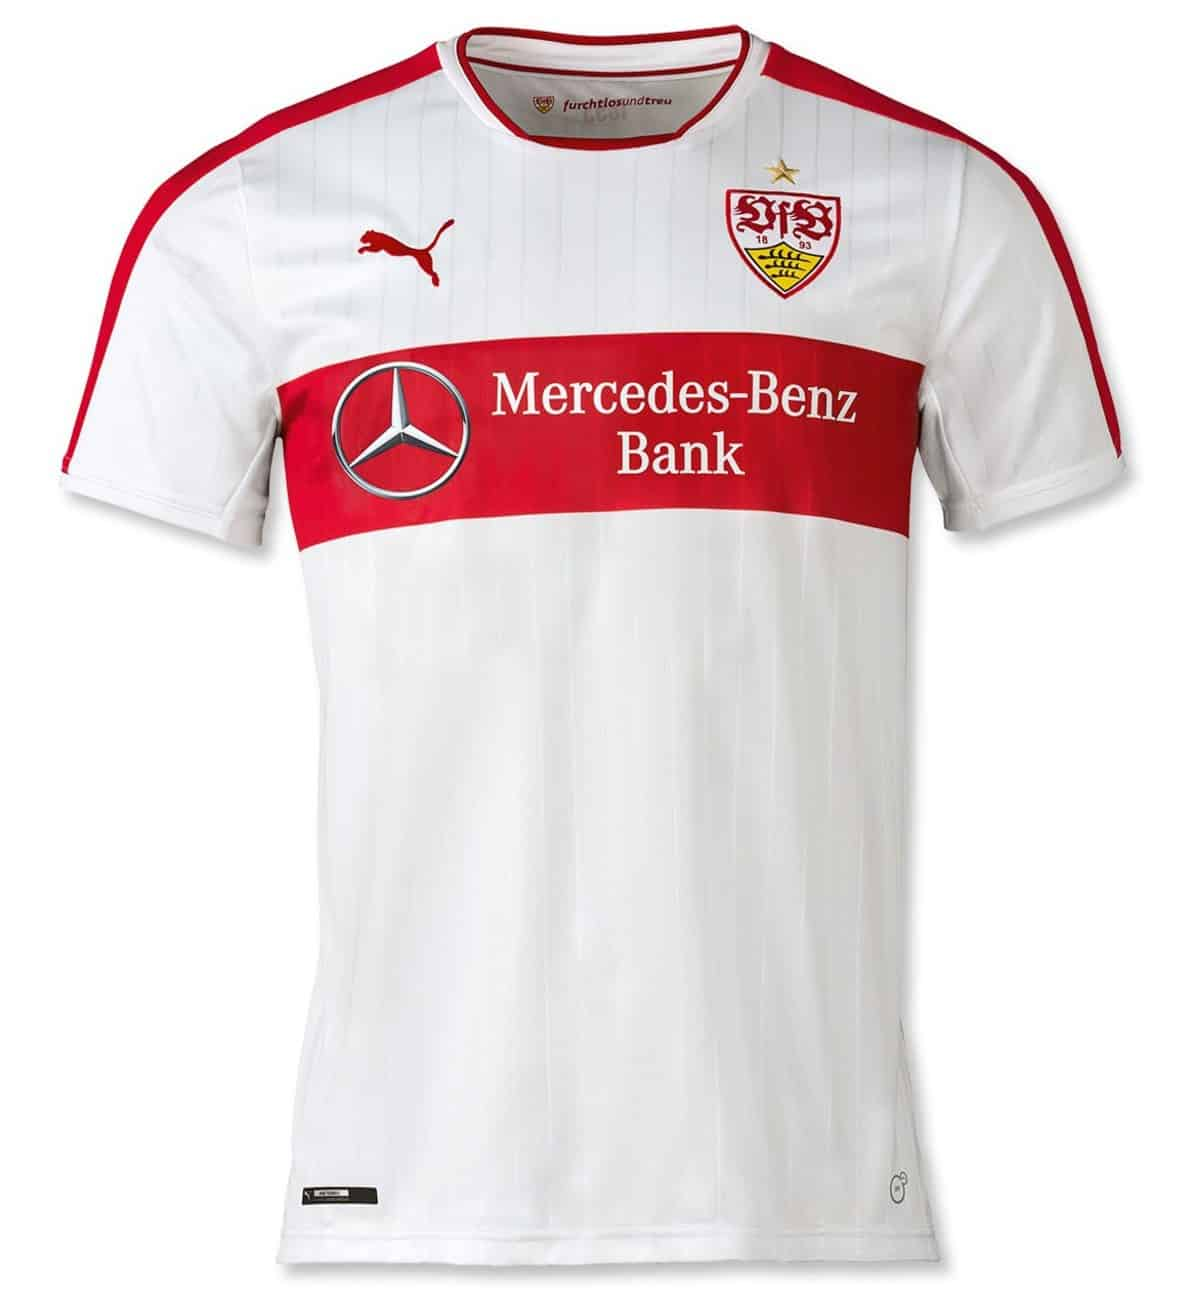 maillot-domicile-vfb-stuttgart-2016-2017 (2)